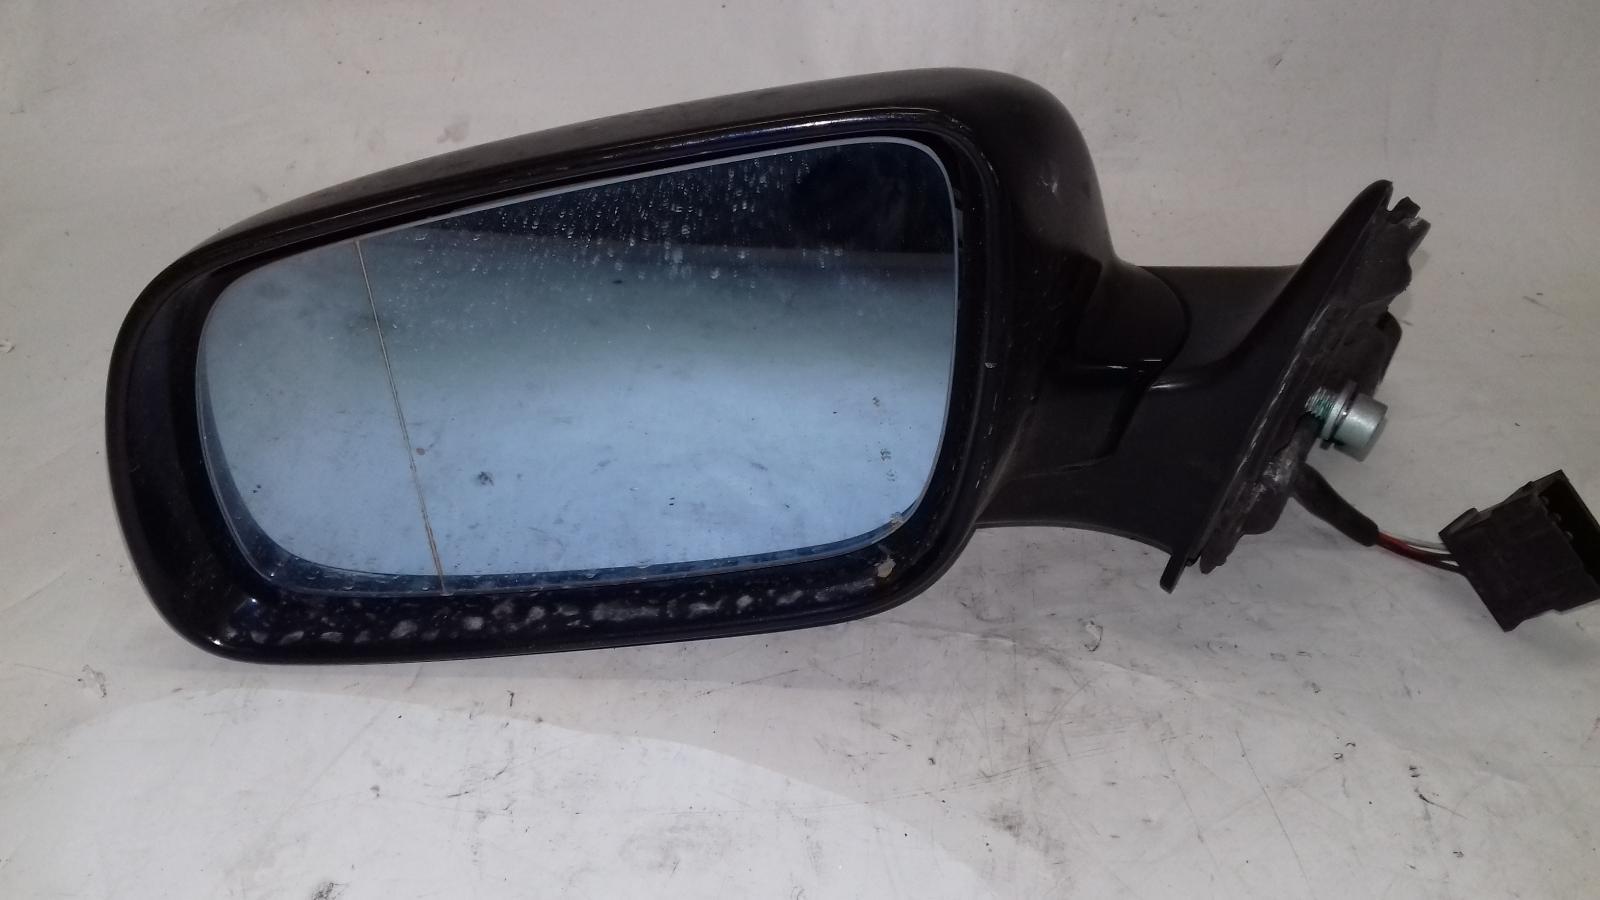 Miroir-de-porte-gauche-audi-a3-audi-a3-0-154169